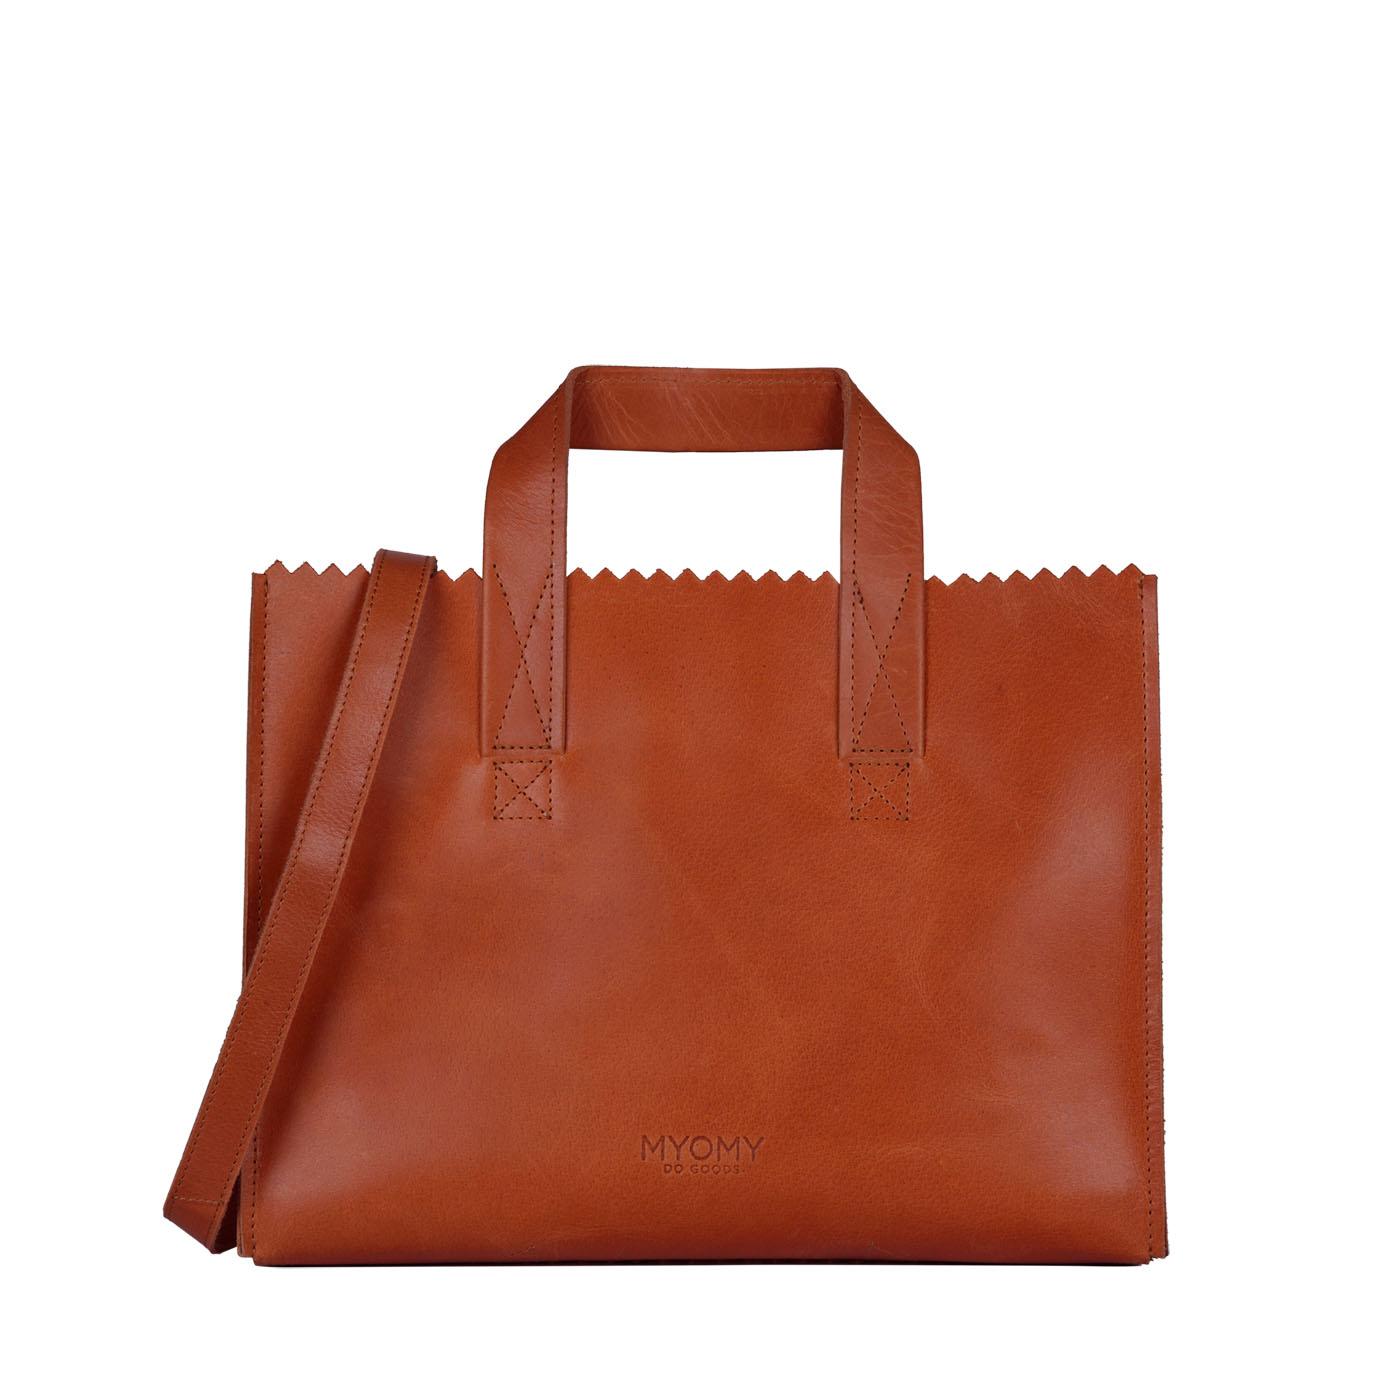 Body Cross Ginger My Myomy Waxy Paper Handbag Bag Hunter UOxn41I